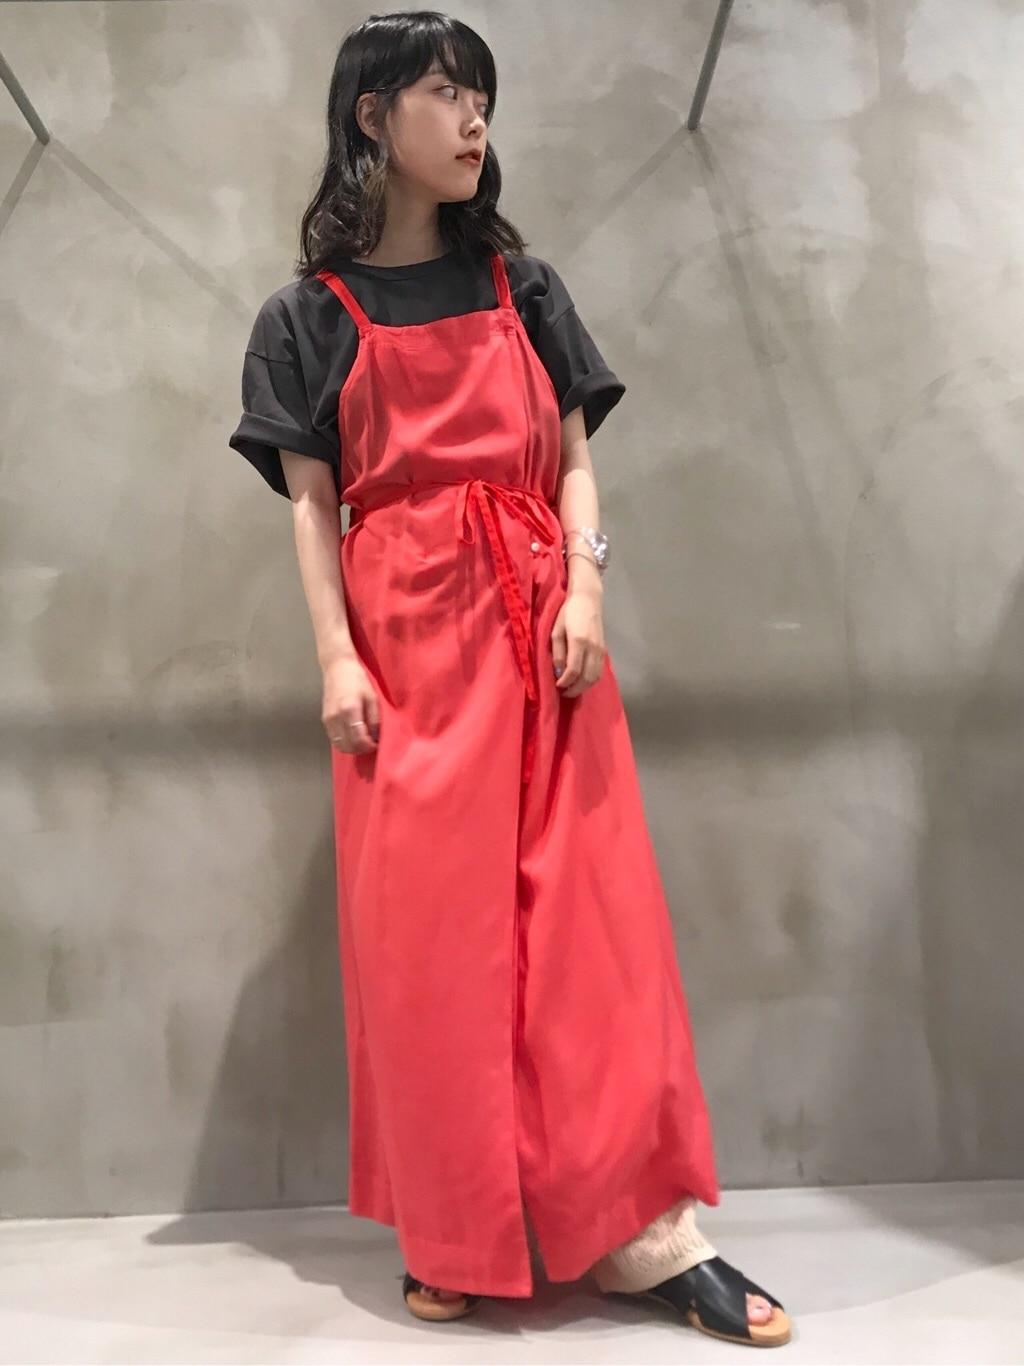 bulle de savon 渋谷スクランブルスクエア 身長:153cm 2020.06.15